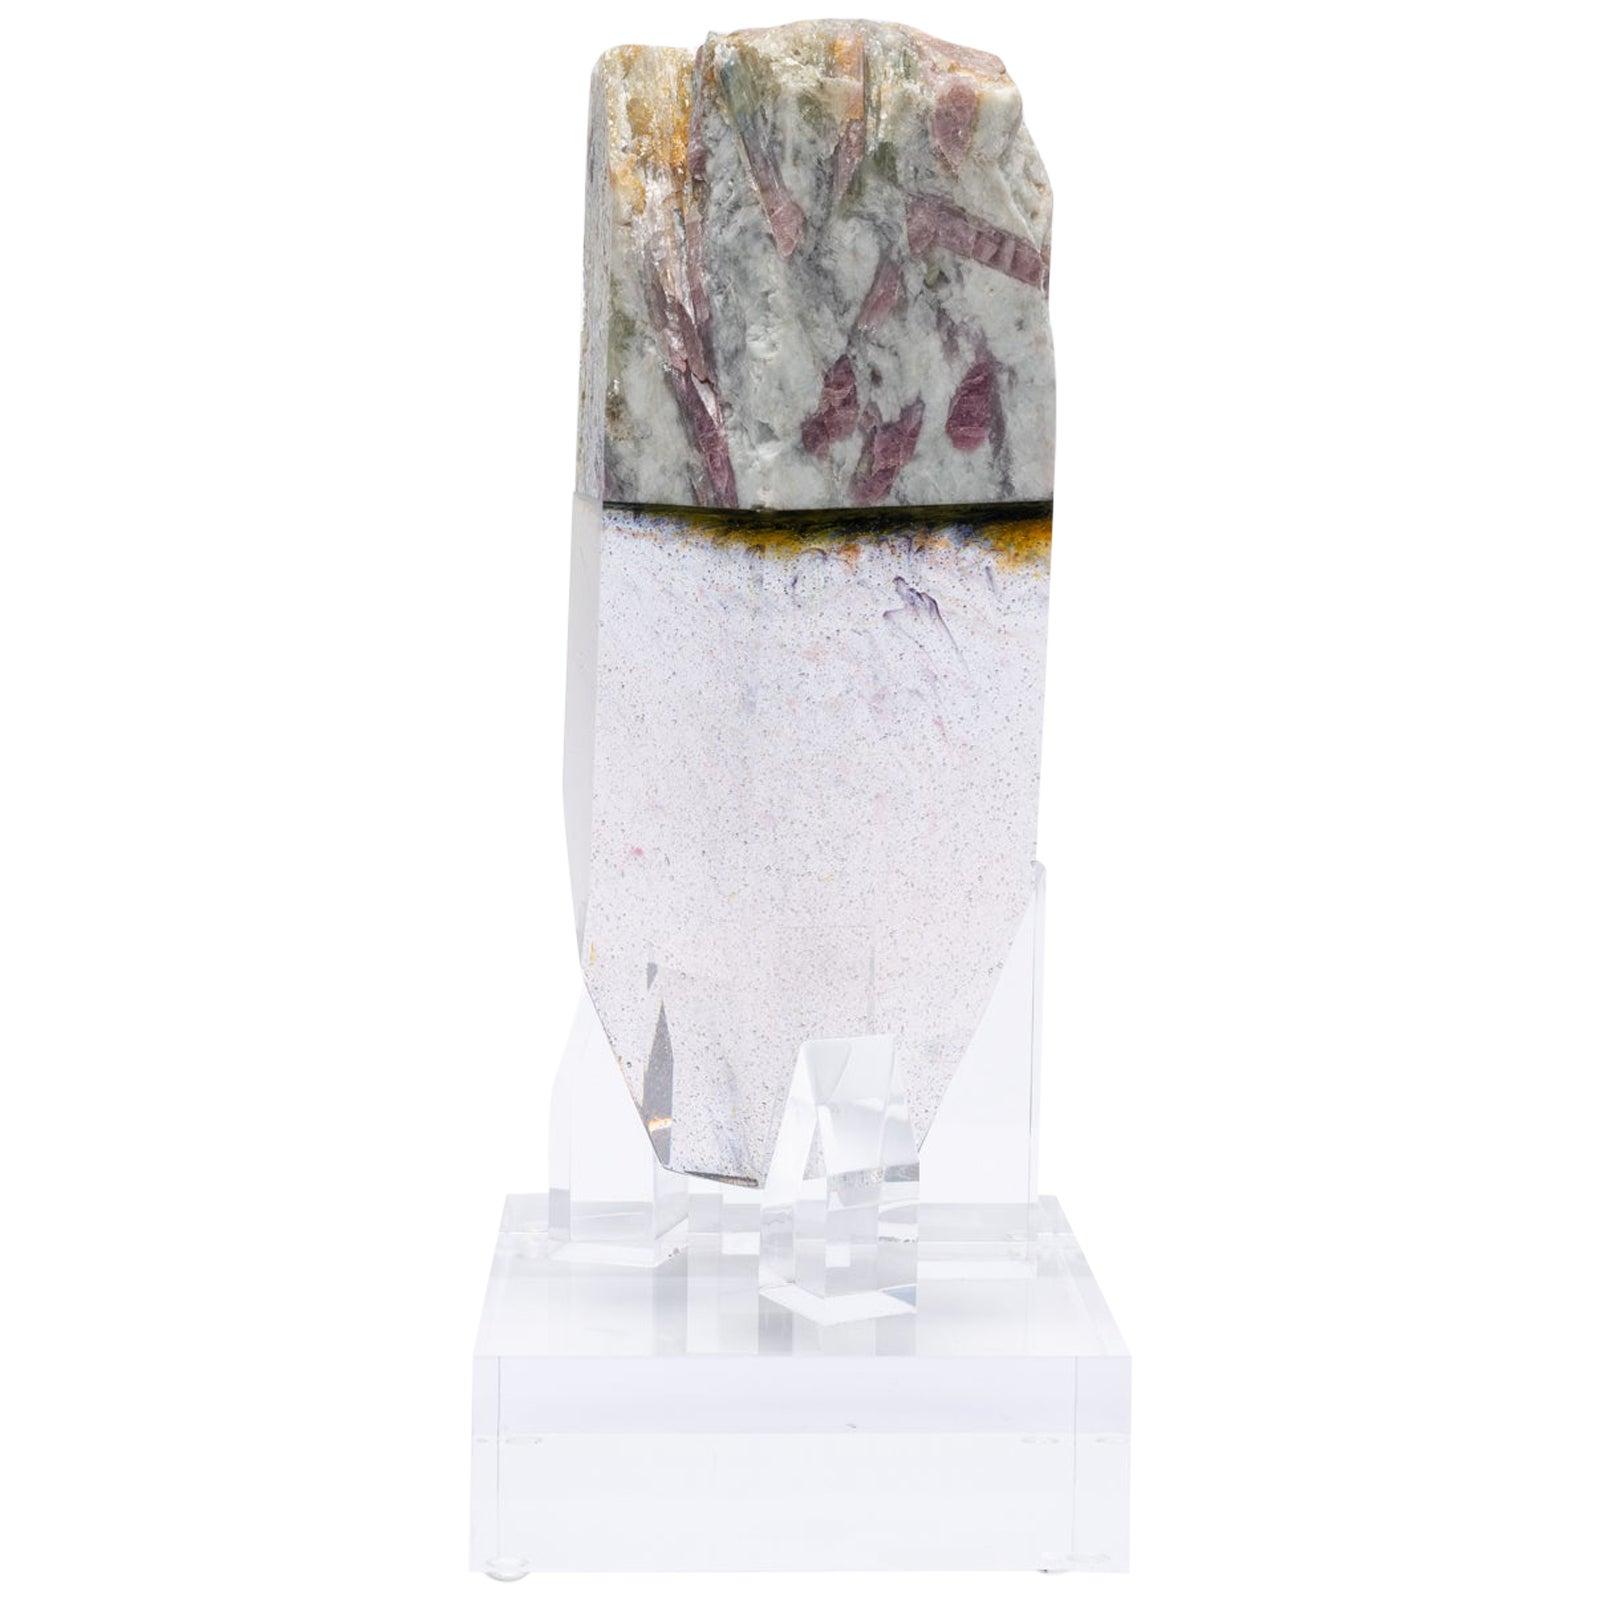 Watermelon Tourmaline and Quartz Organic Shape Glass Fusion Sculpture on Acrylic